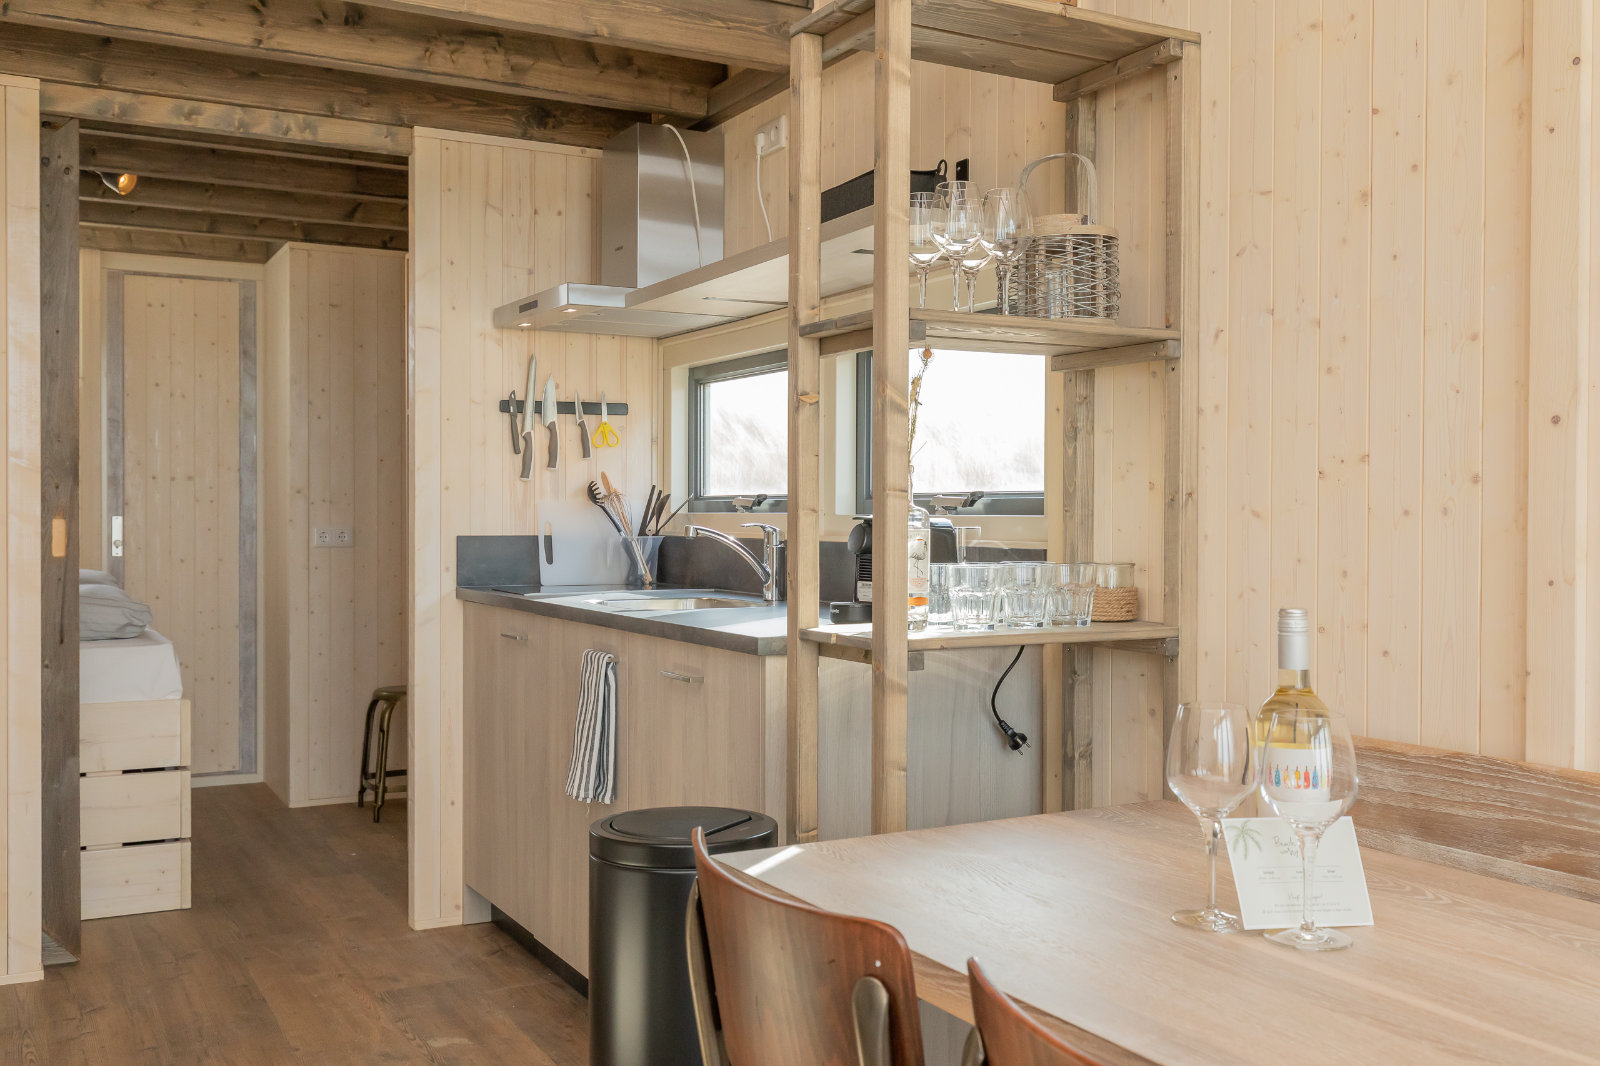 MK4 tiny house - kitchen